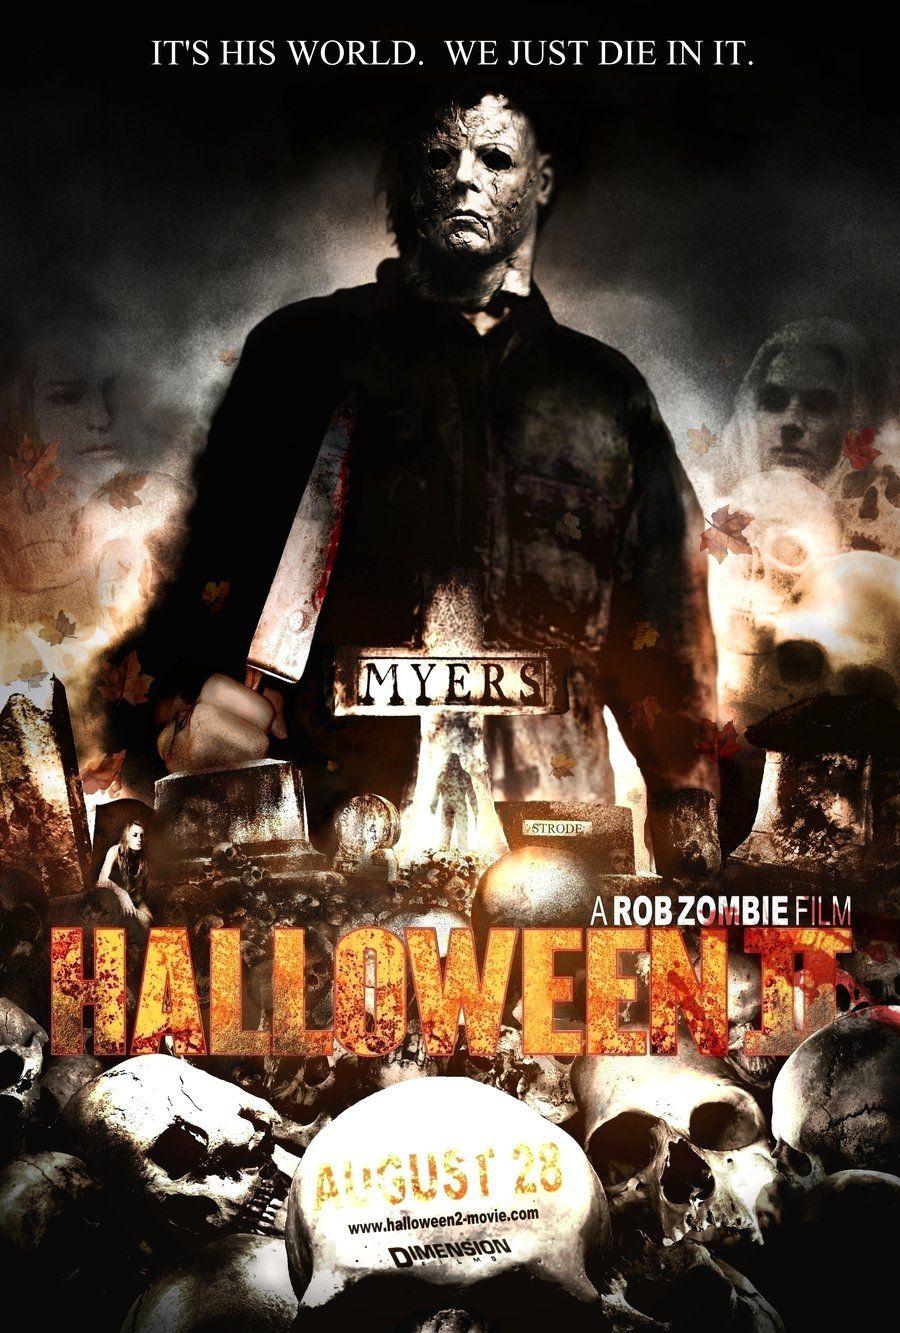 Halloween posters Halloween 2 2009 Poster My halloween